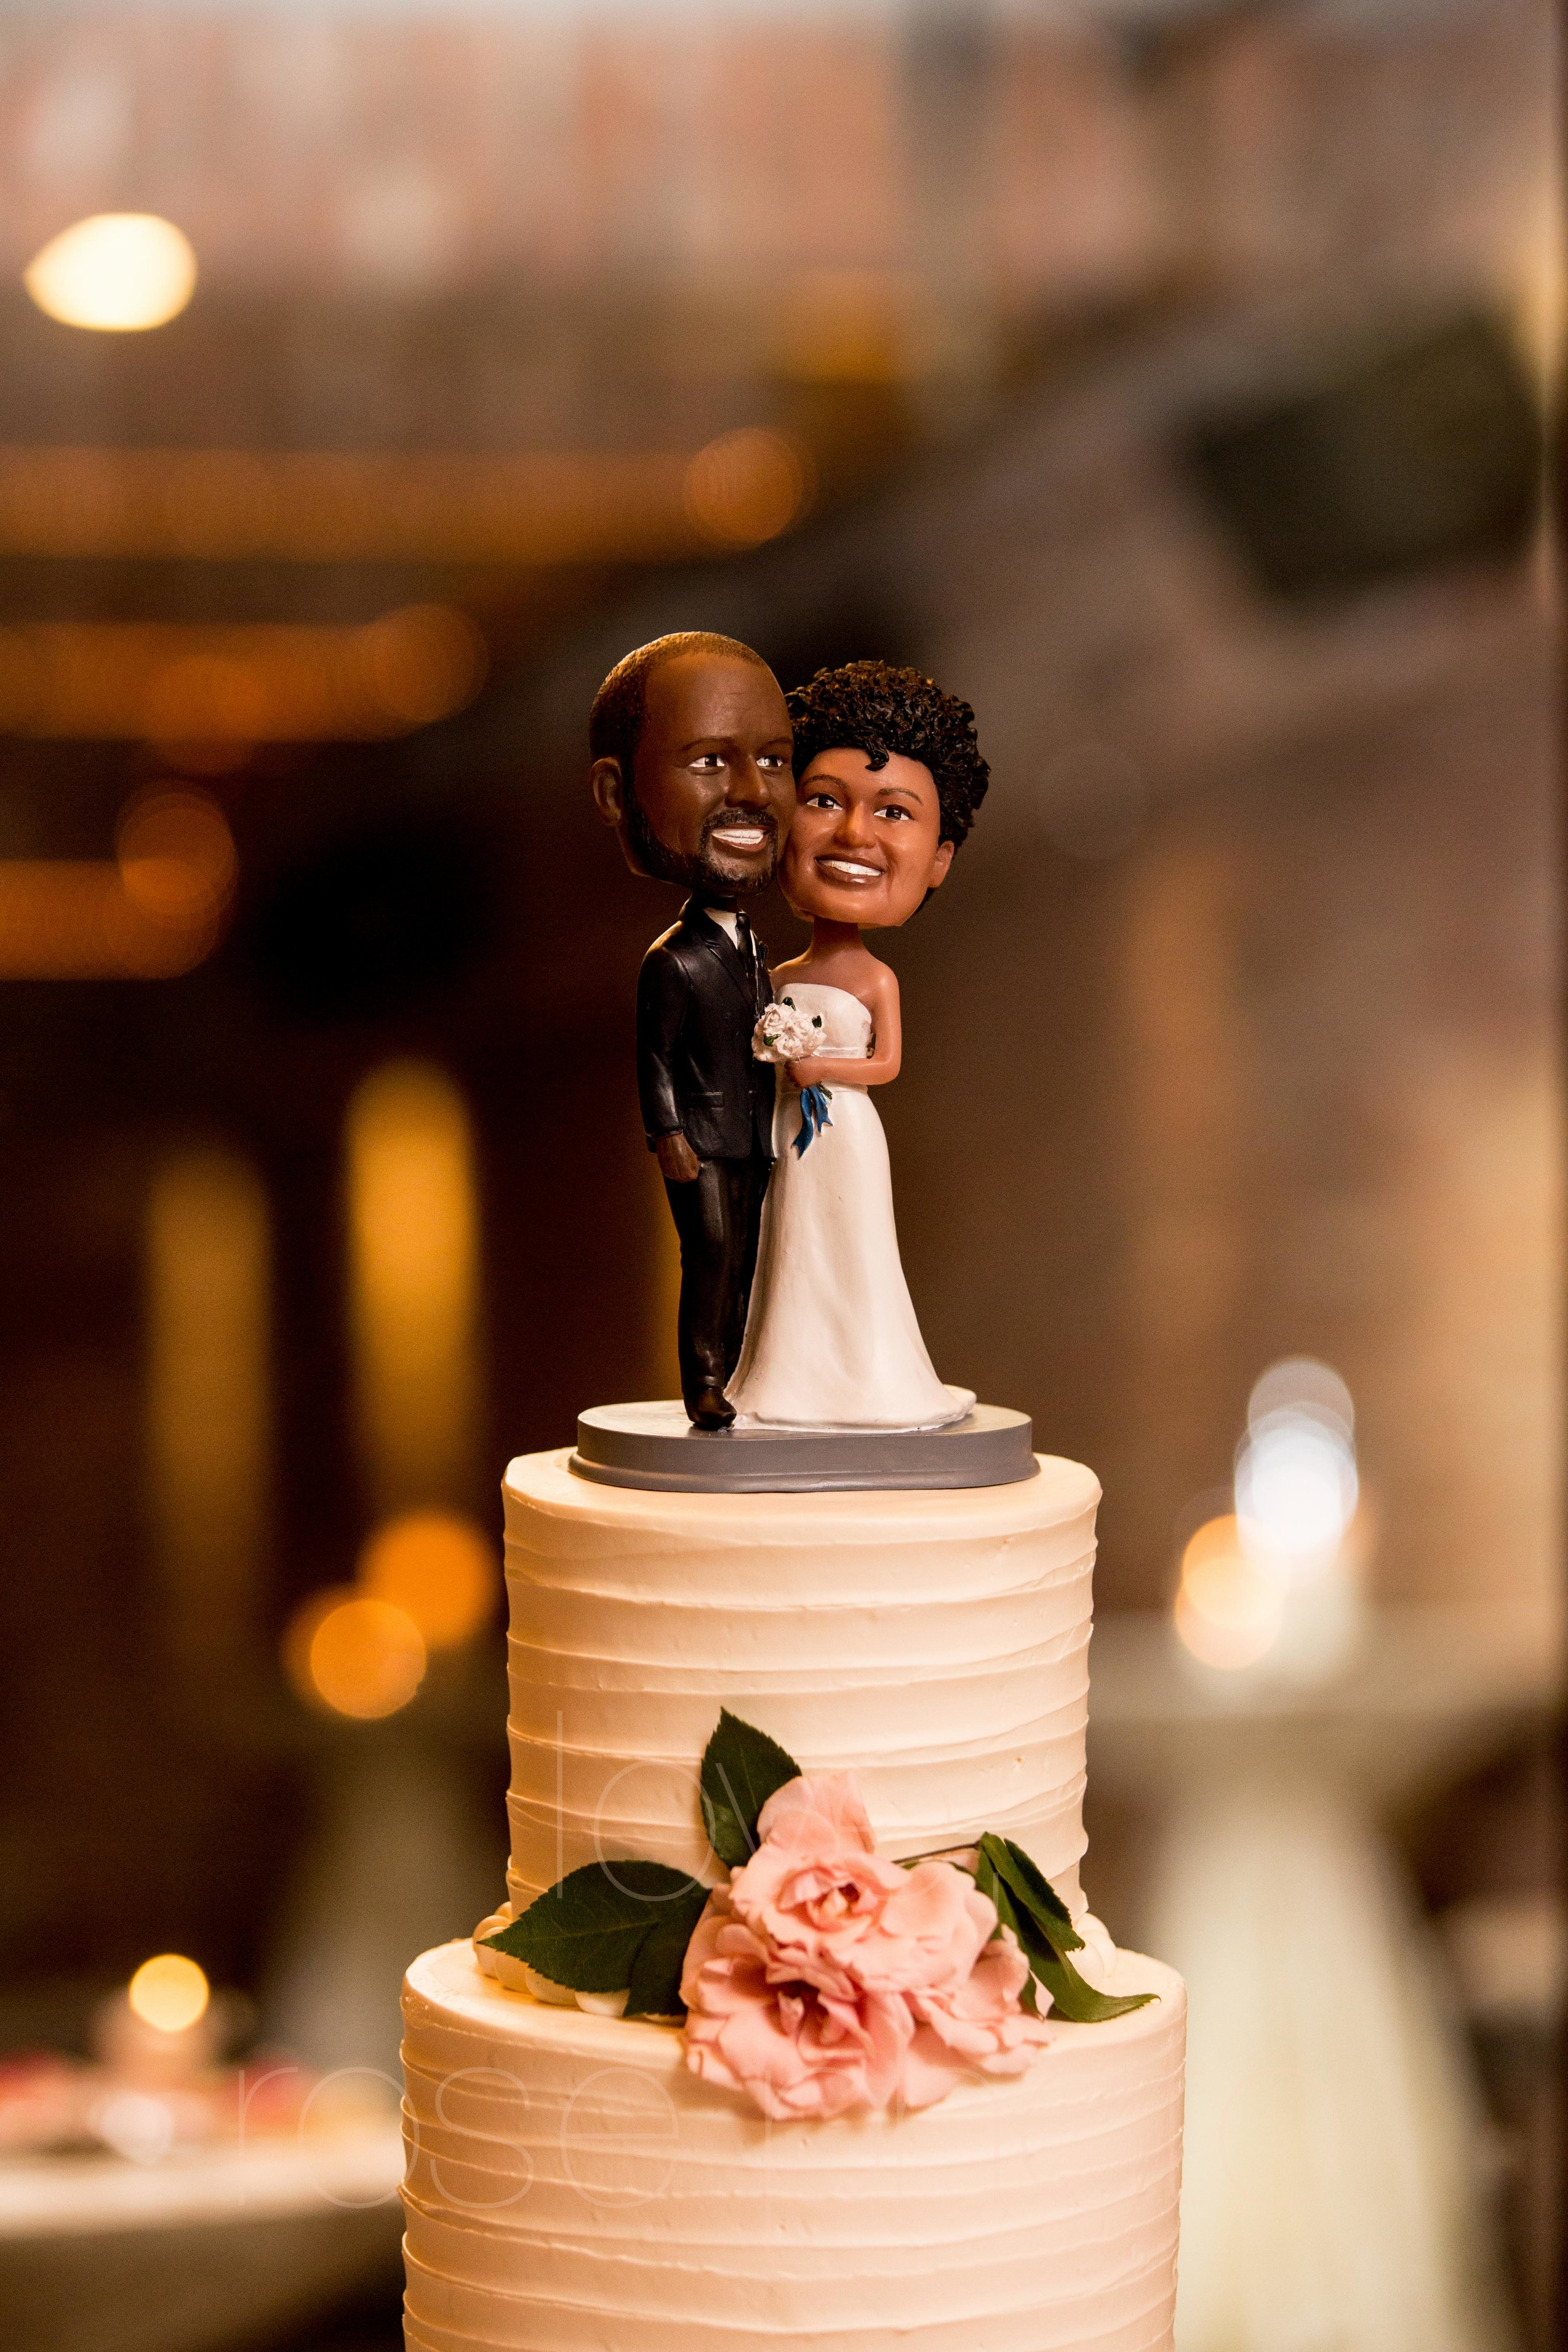 BRACEY rose photo chicago nyc wedding photographer asheville-61.jpg